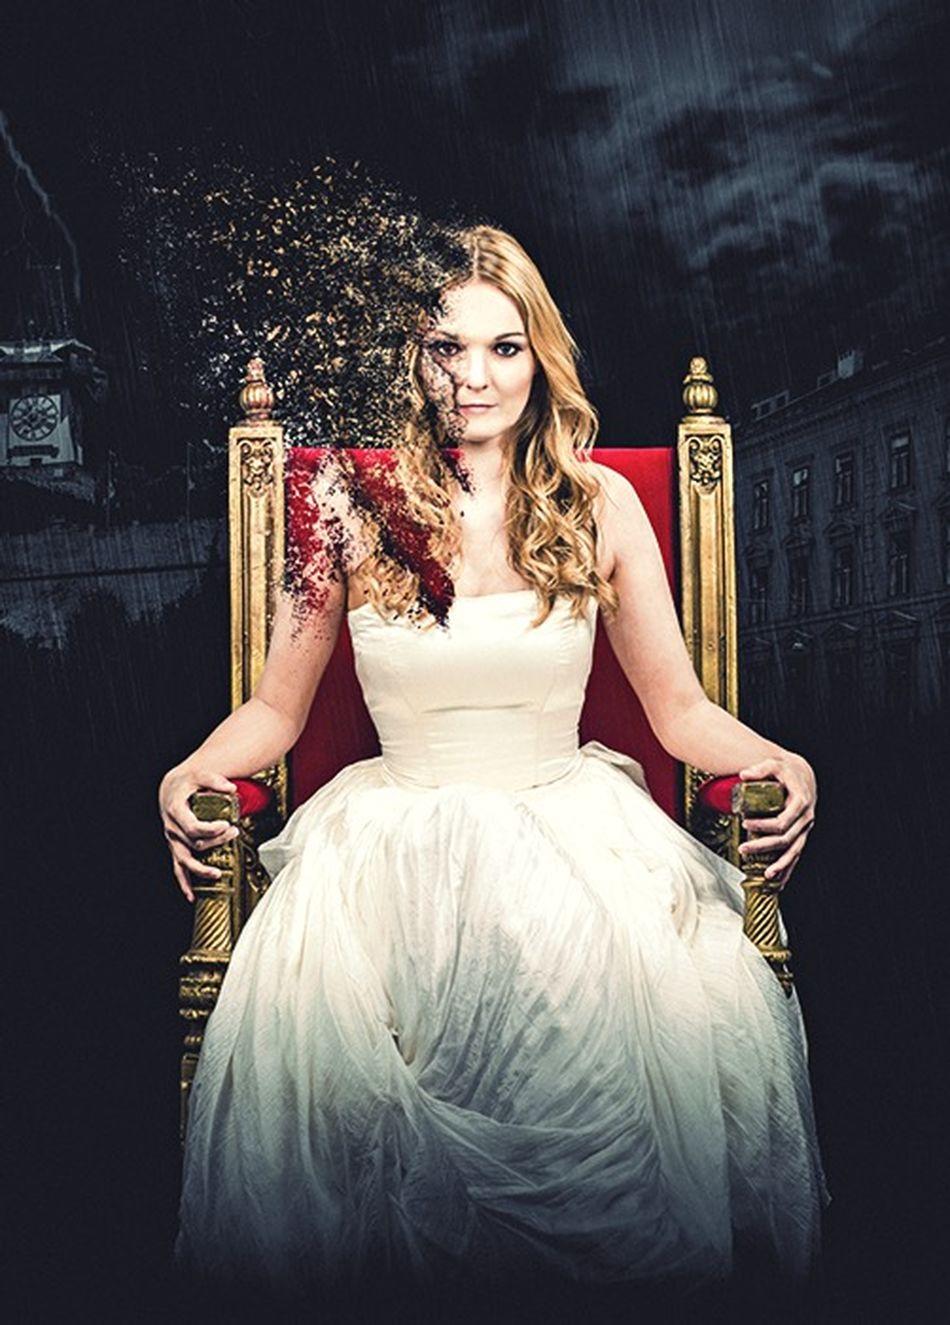 Portrait EyeEm Best Shots Check This Out Halloween Beauty halloweensujet 2015 🎃💀